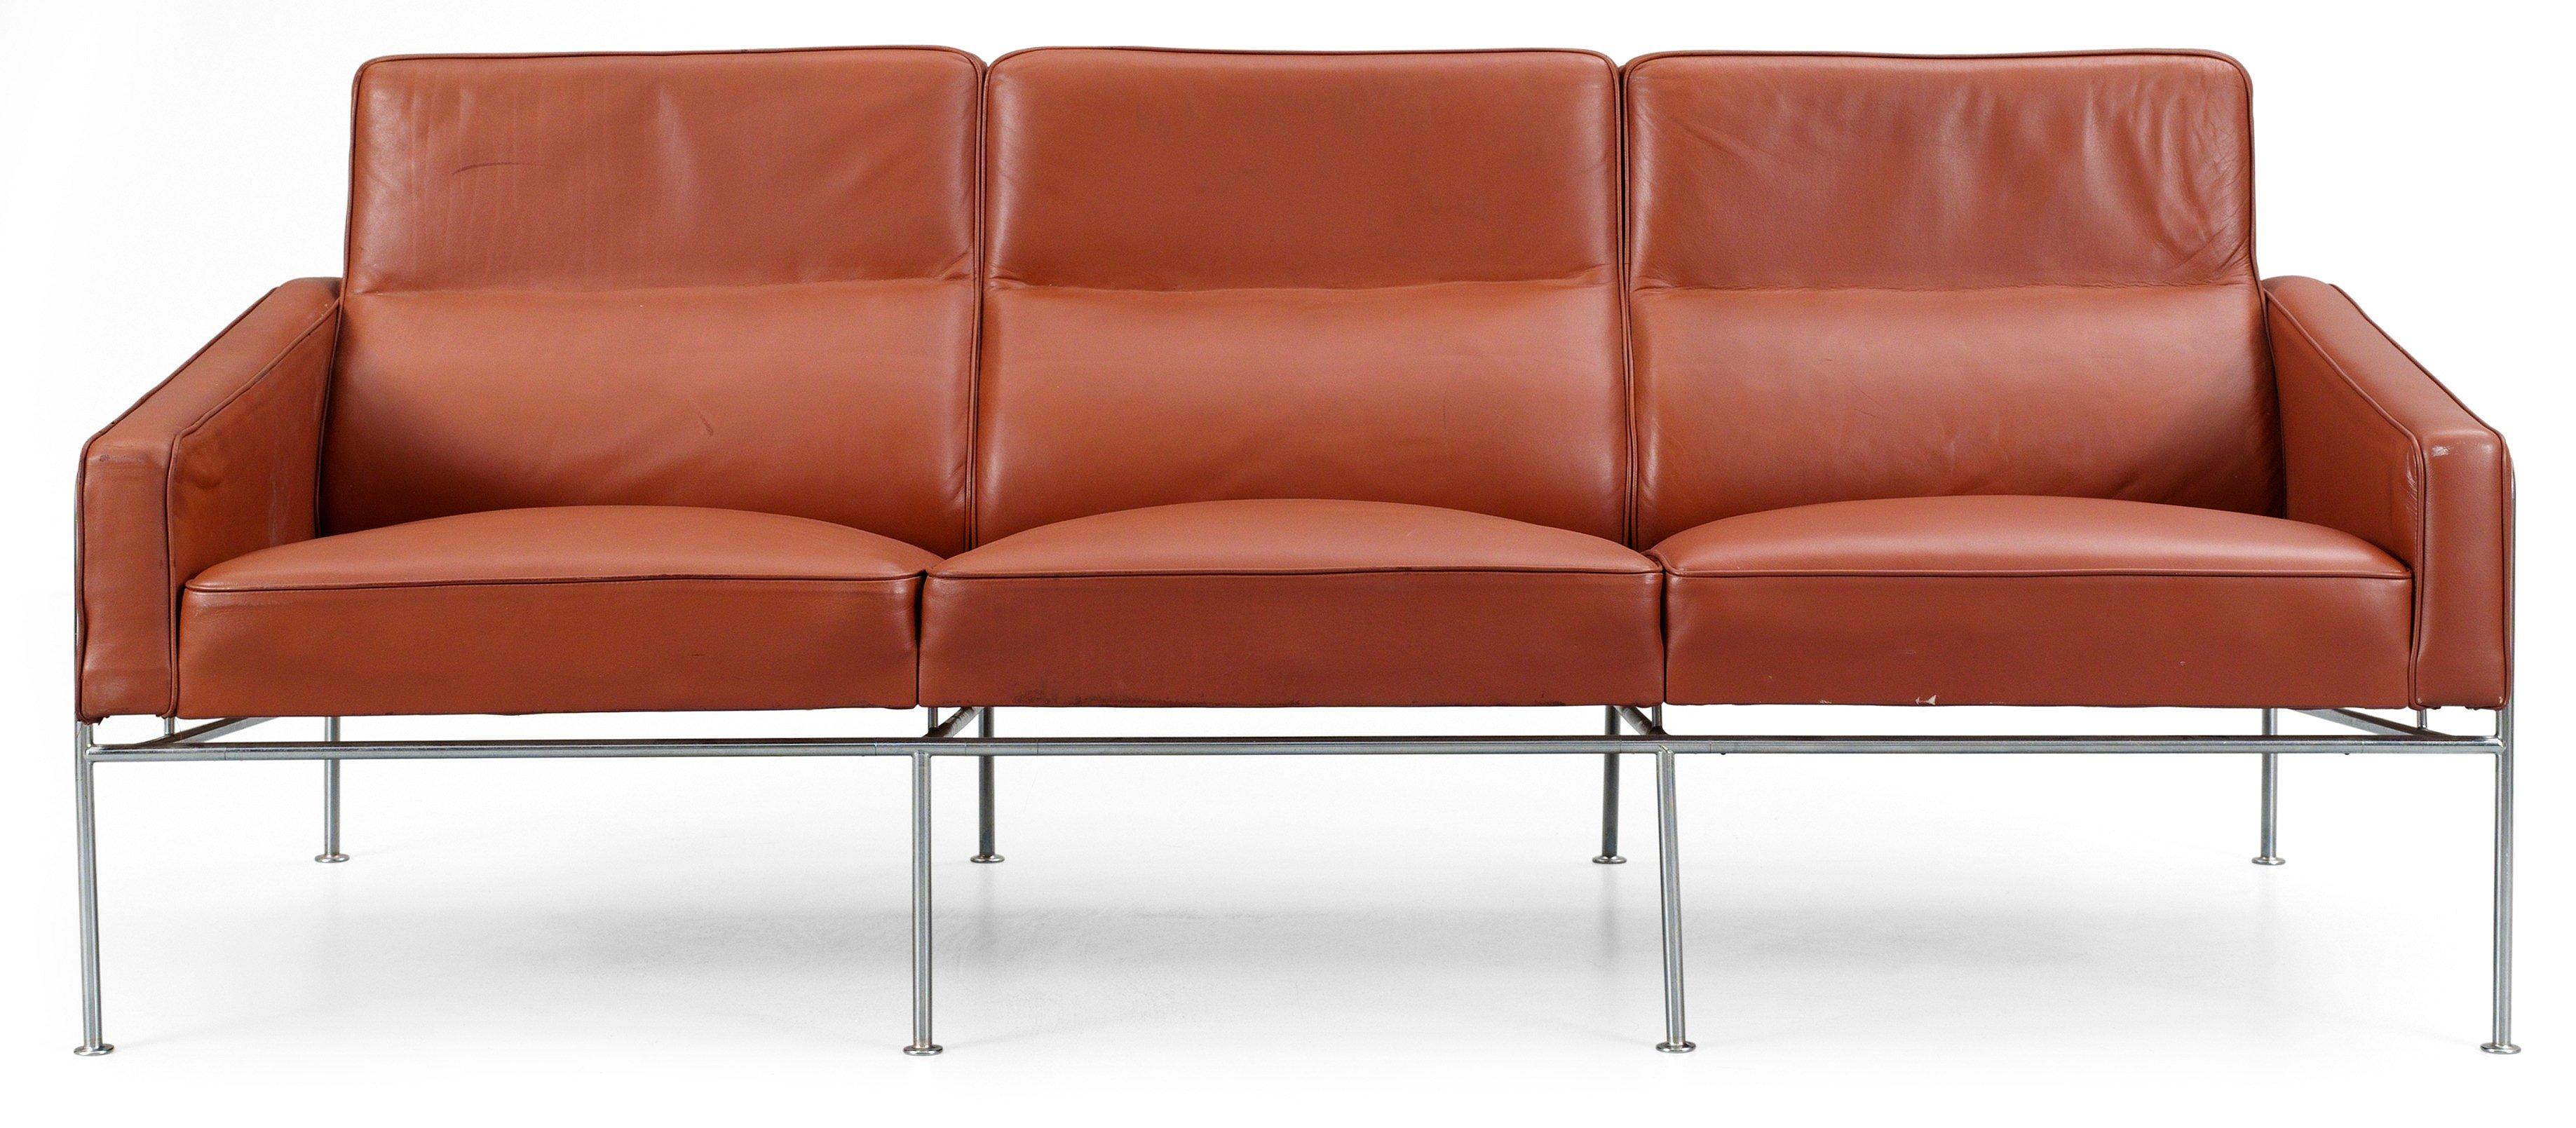 Fritz hansen soffa